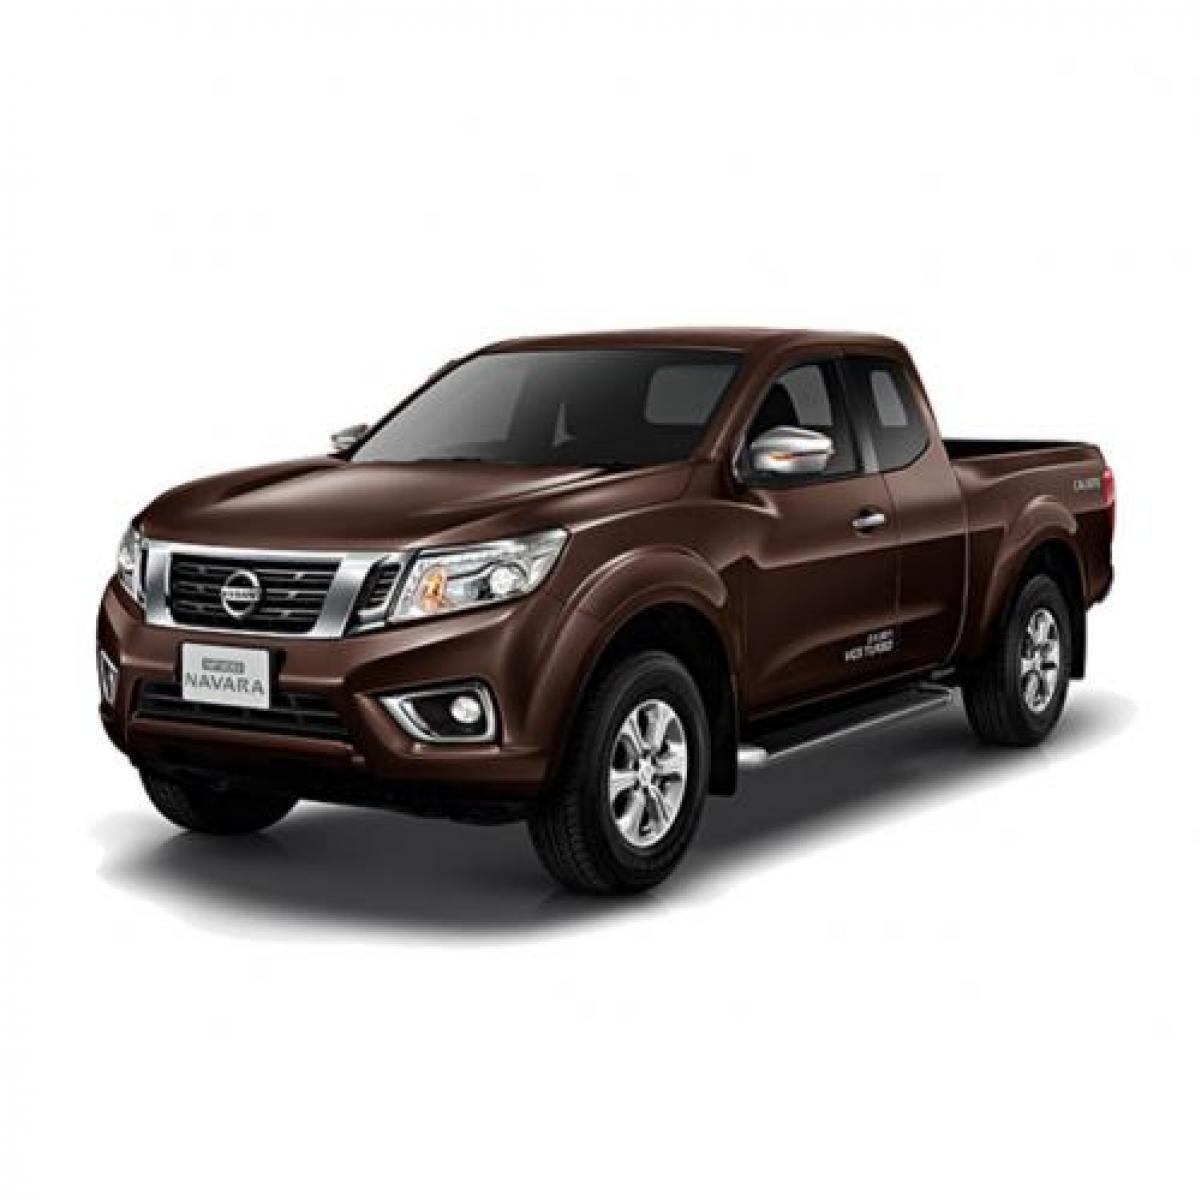 Rear View Mirror LENS LH Side Door Fit For Nissan Navara D23 NP300 Truck 2014-17